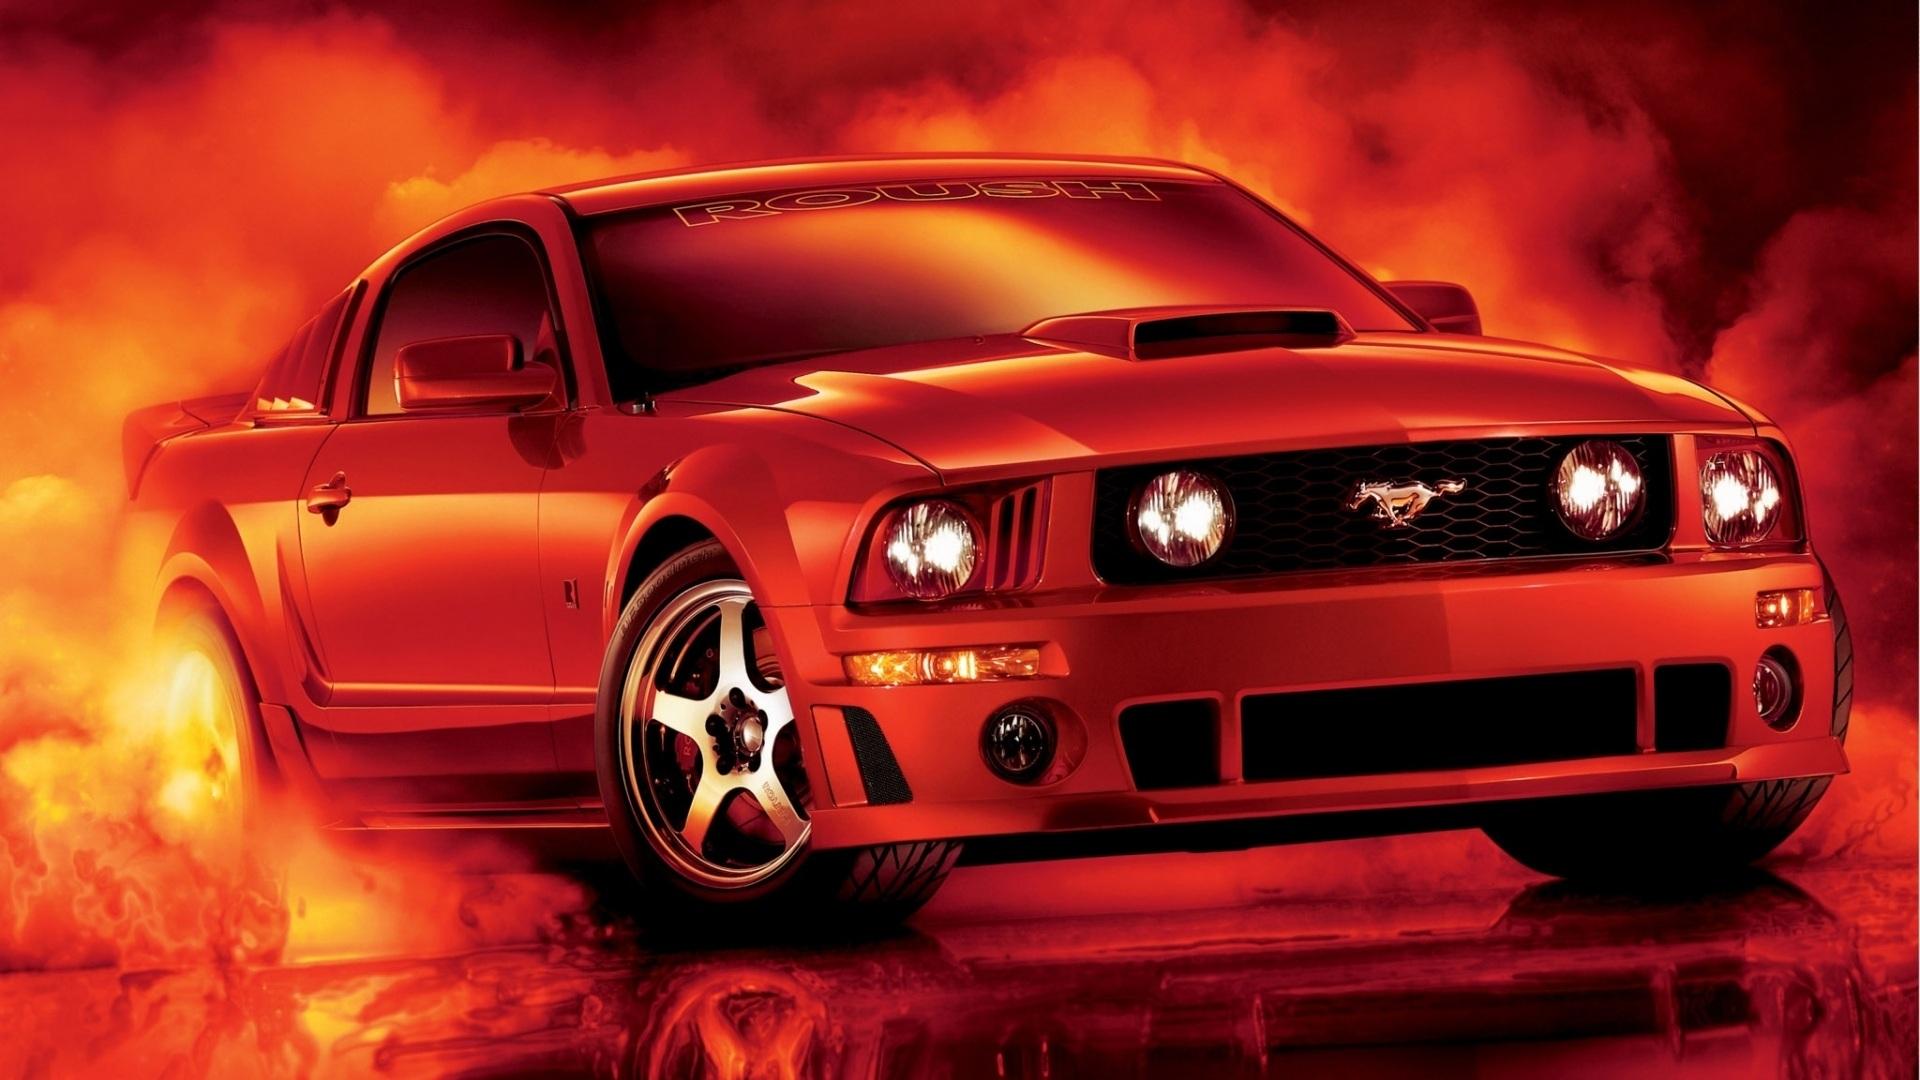 Download Wallpaper 1920x1080 Red Ford mustang car Full HD ...